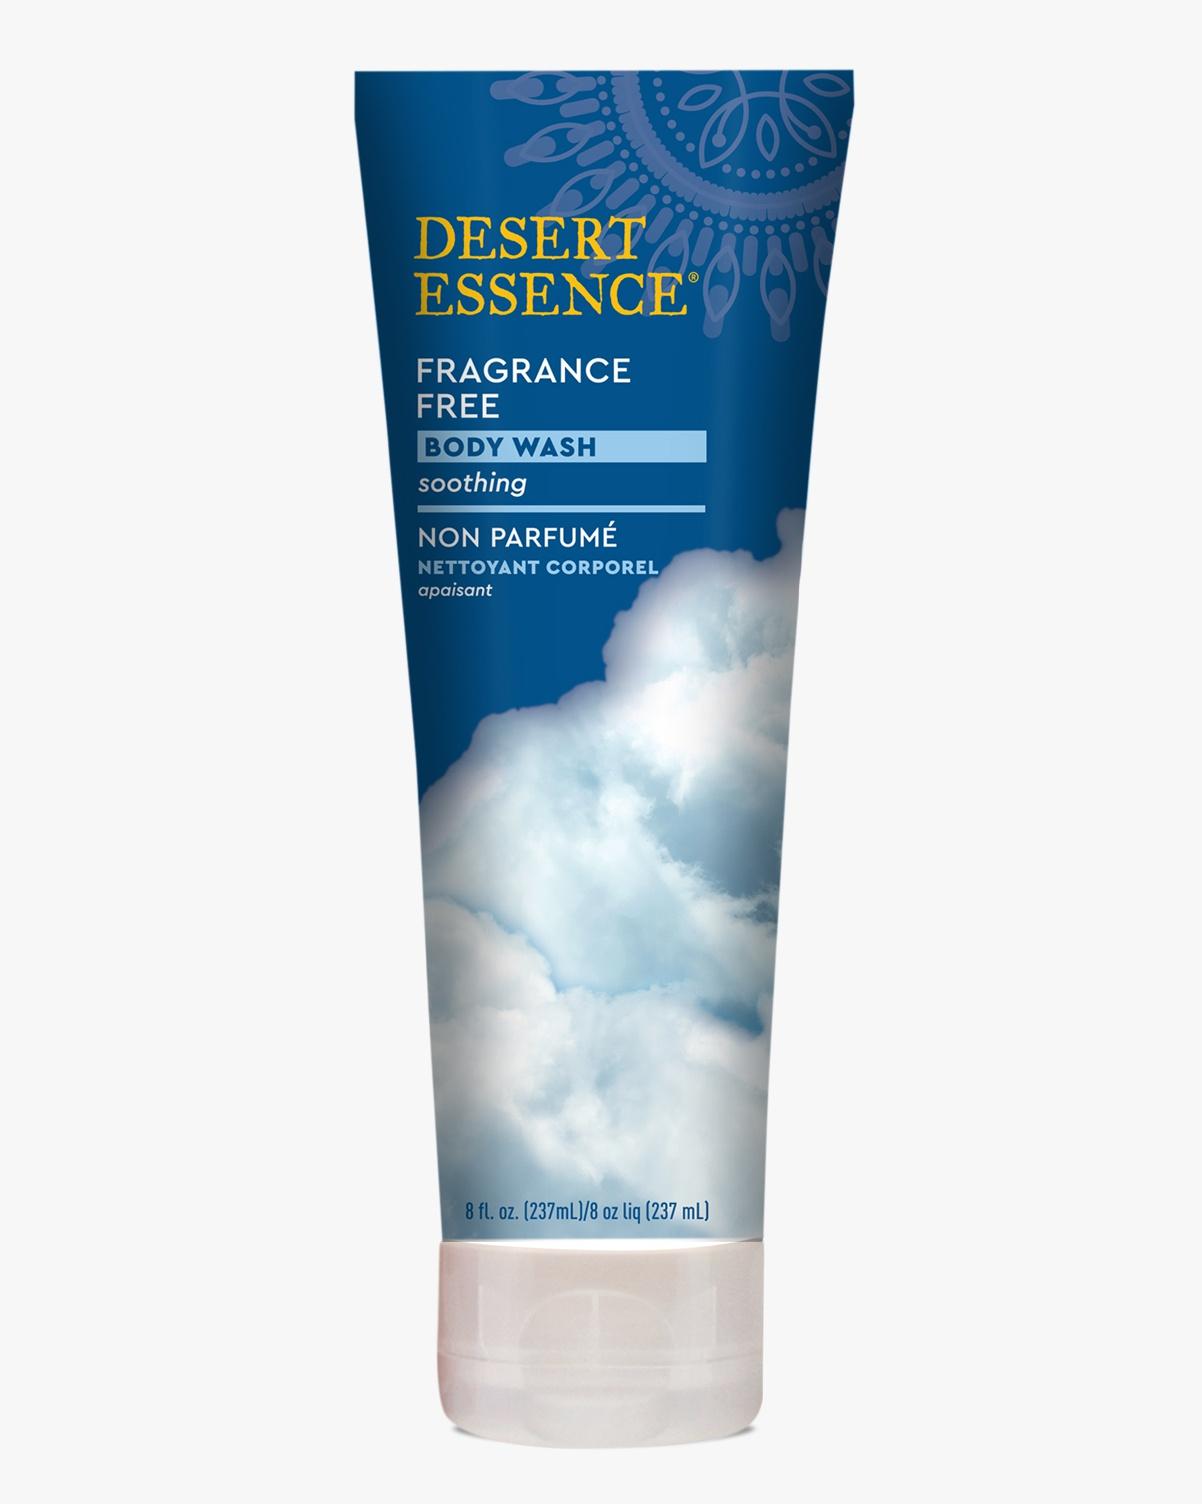 Desert Essence Fragrance-Free Body Wash